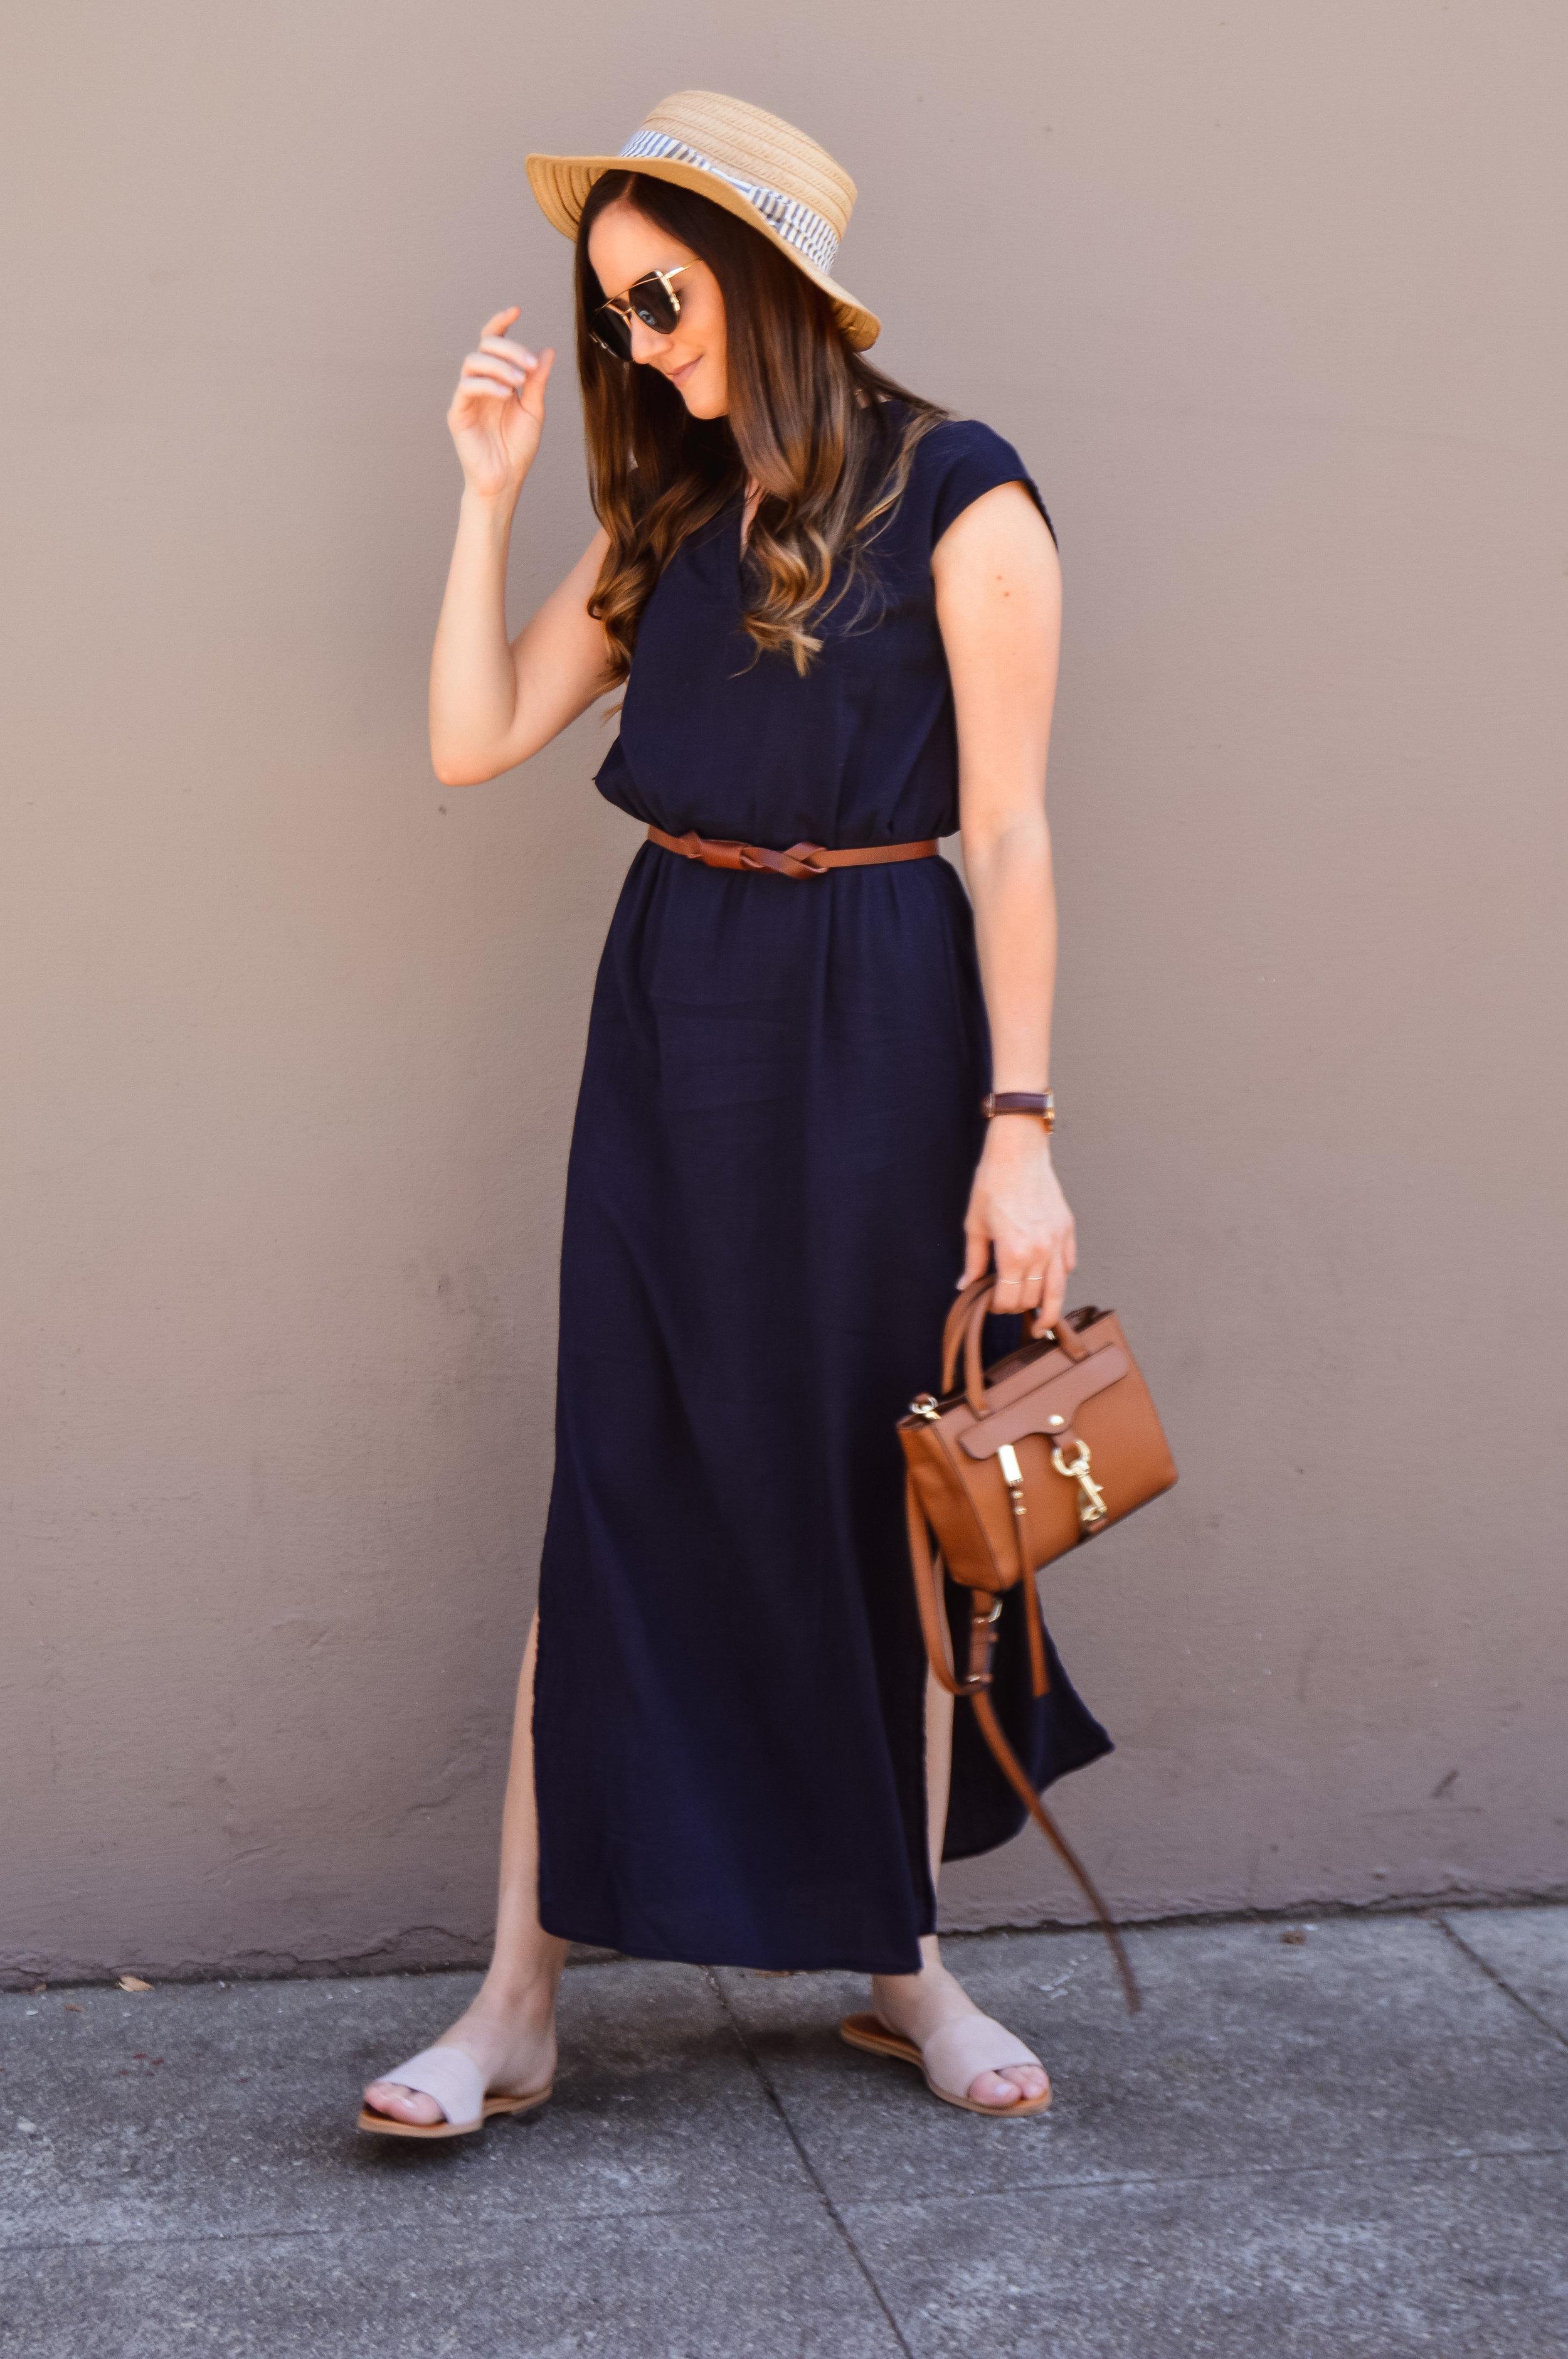 Shop the Look Below.  Amazon Dress  c/o |  Nordstrom Sandals  | Nordstrom Hat—similar  here  |  Rebecca Minkoff Bag  |  Amazon Sunglasses  c/o |  Amazon Necklace  c/o |  Amazon Belt  c/o